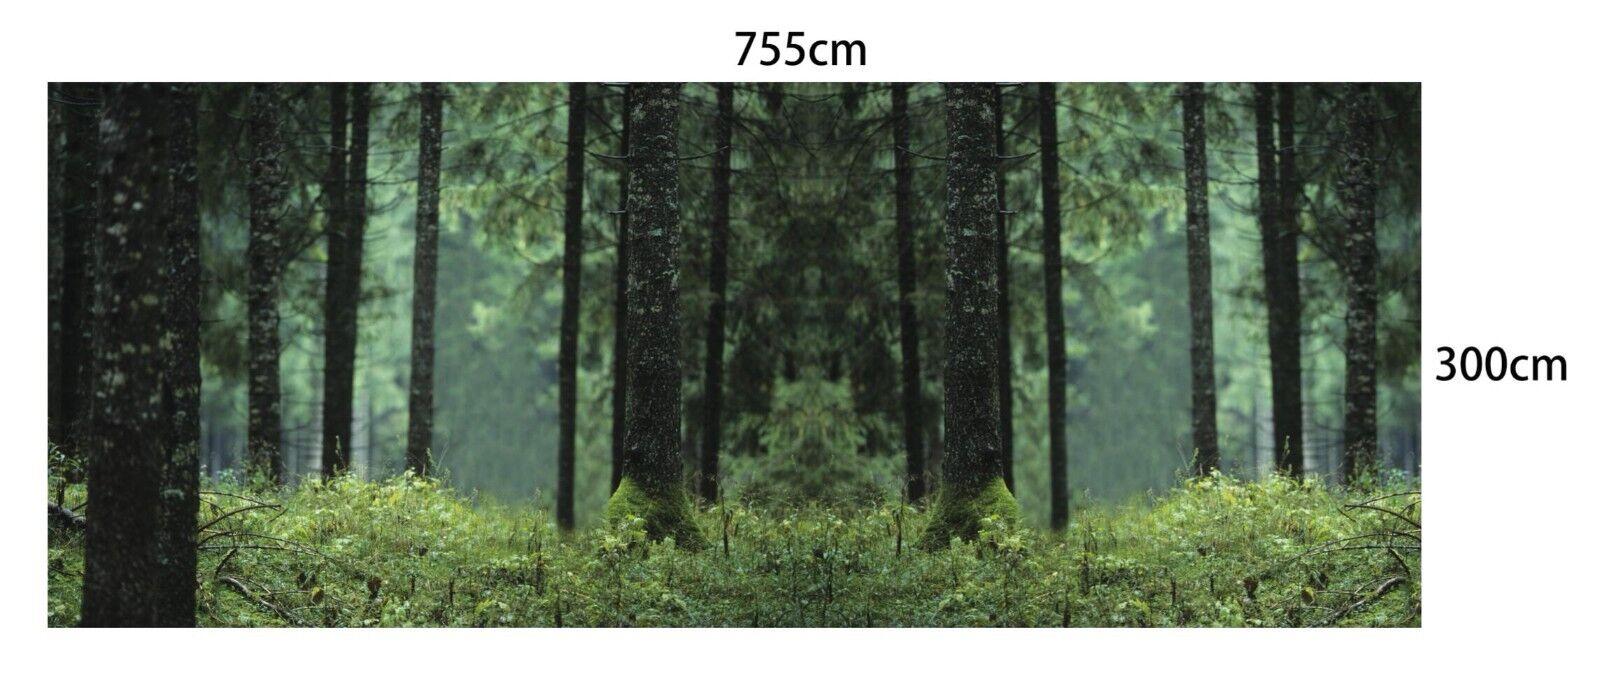 3D Forest deer 533 WallPaper Bathroom Print Decal Wall Deco AJ WALLPAPER UK